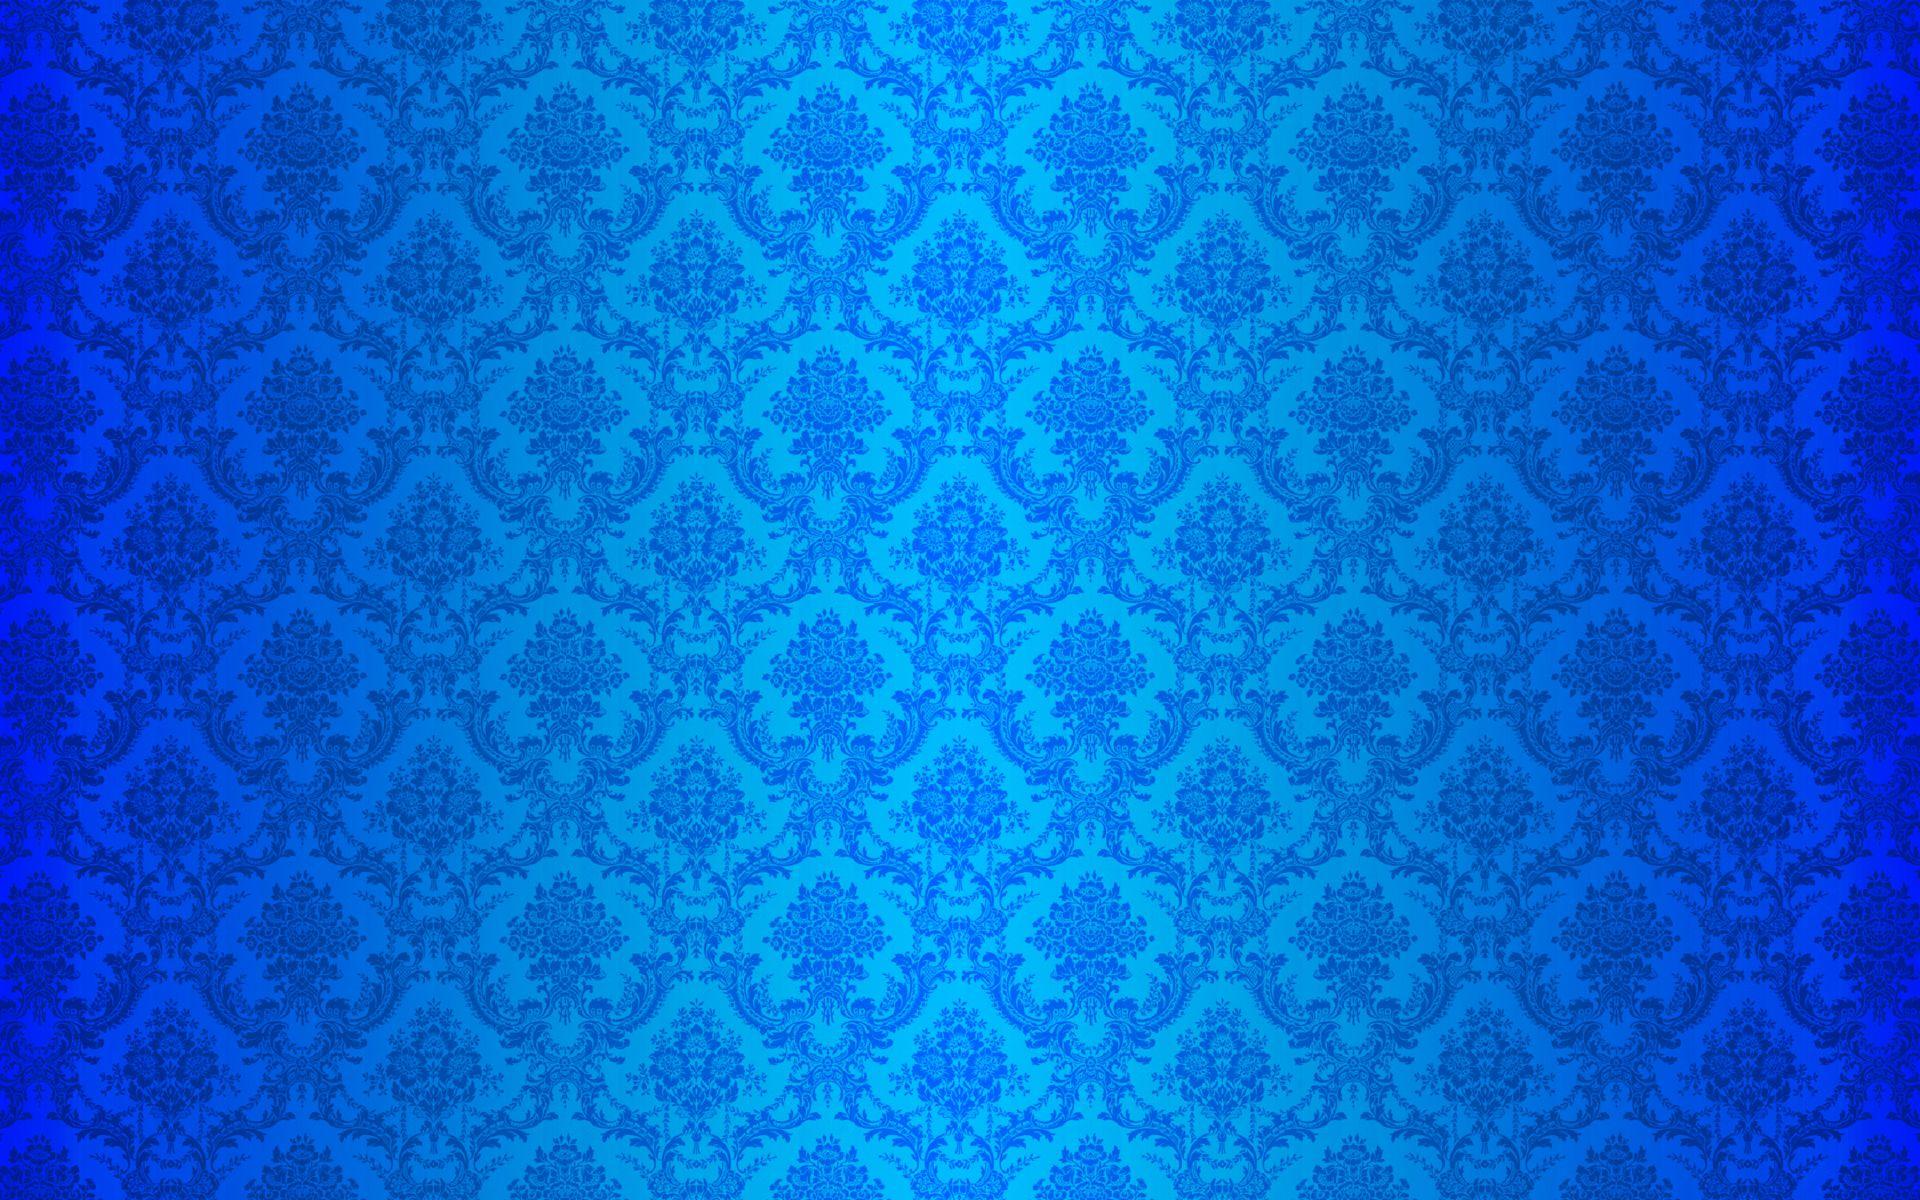 Free photo: Blue Background Pattern - Texture, Grunge, Blue - Free